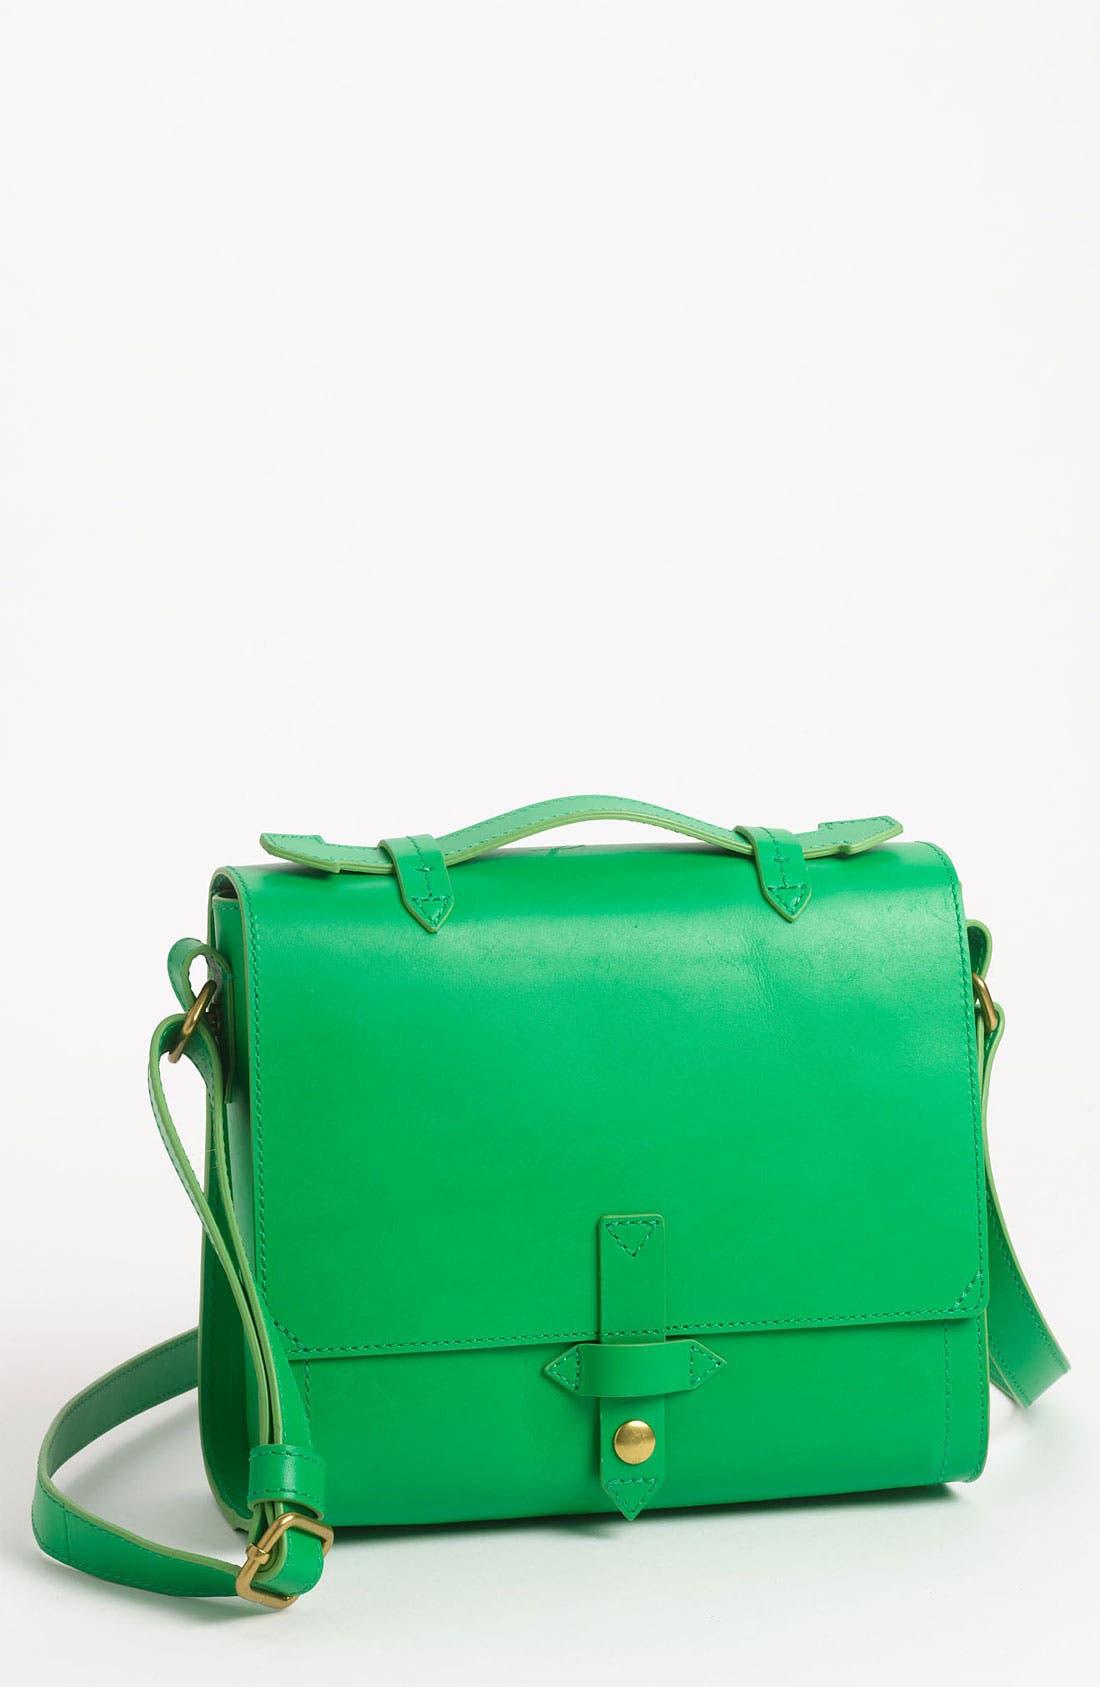 Main Image - IIIBeCa by Joy Gryson 'Hudson Street' Crossbody Bag